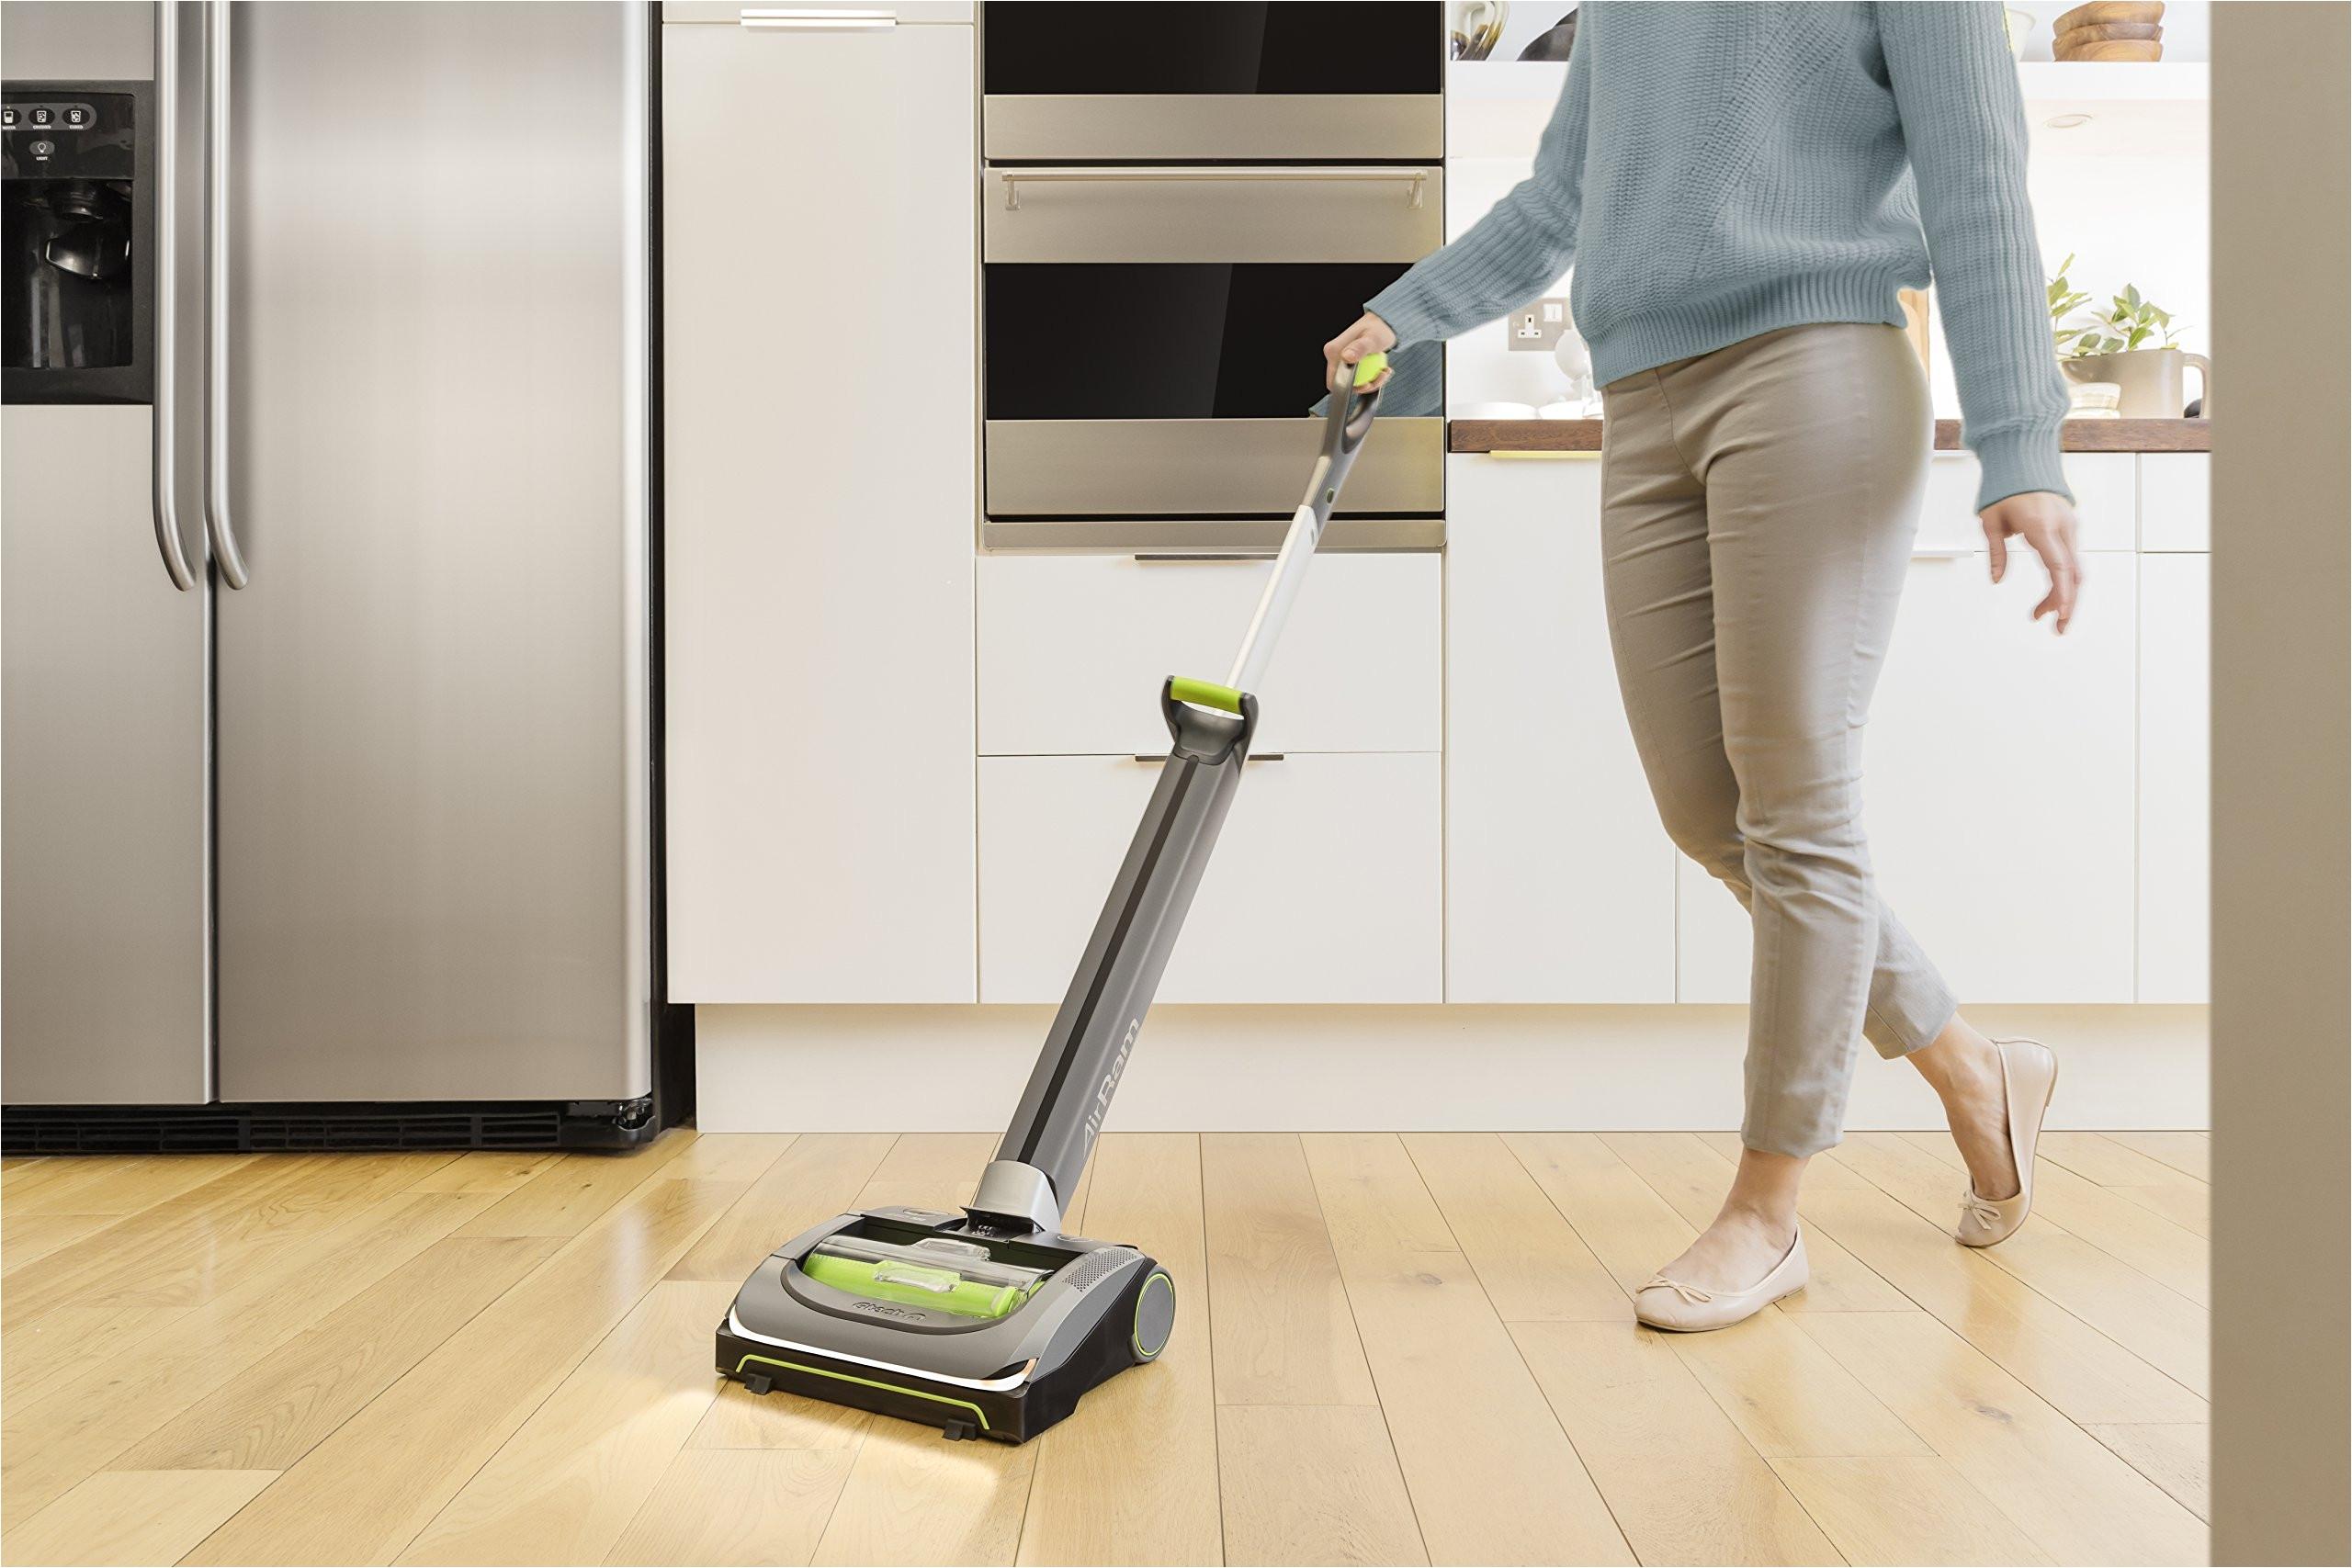 Best Sweeper for Hardwood Floors and Carpet 40 Lovely Best Vacuum for Hardwood Floors and Carpet Consumer